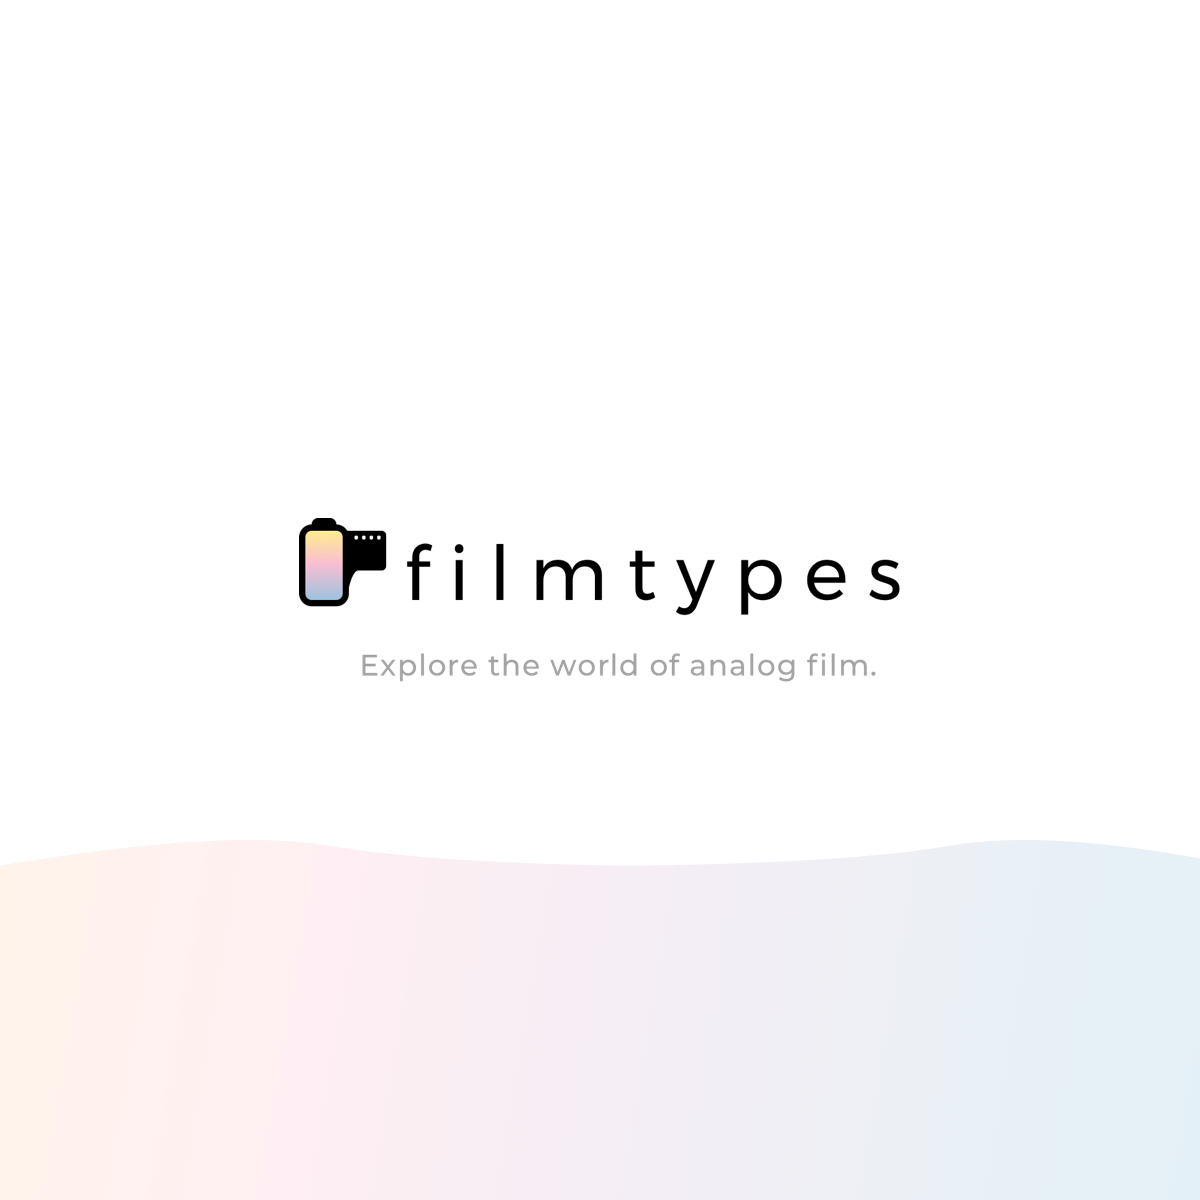 Filmtypes - Explore the world of analog film